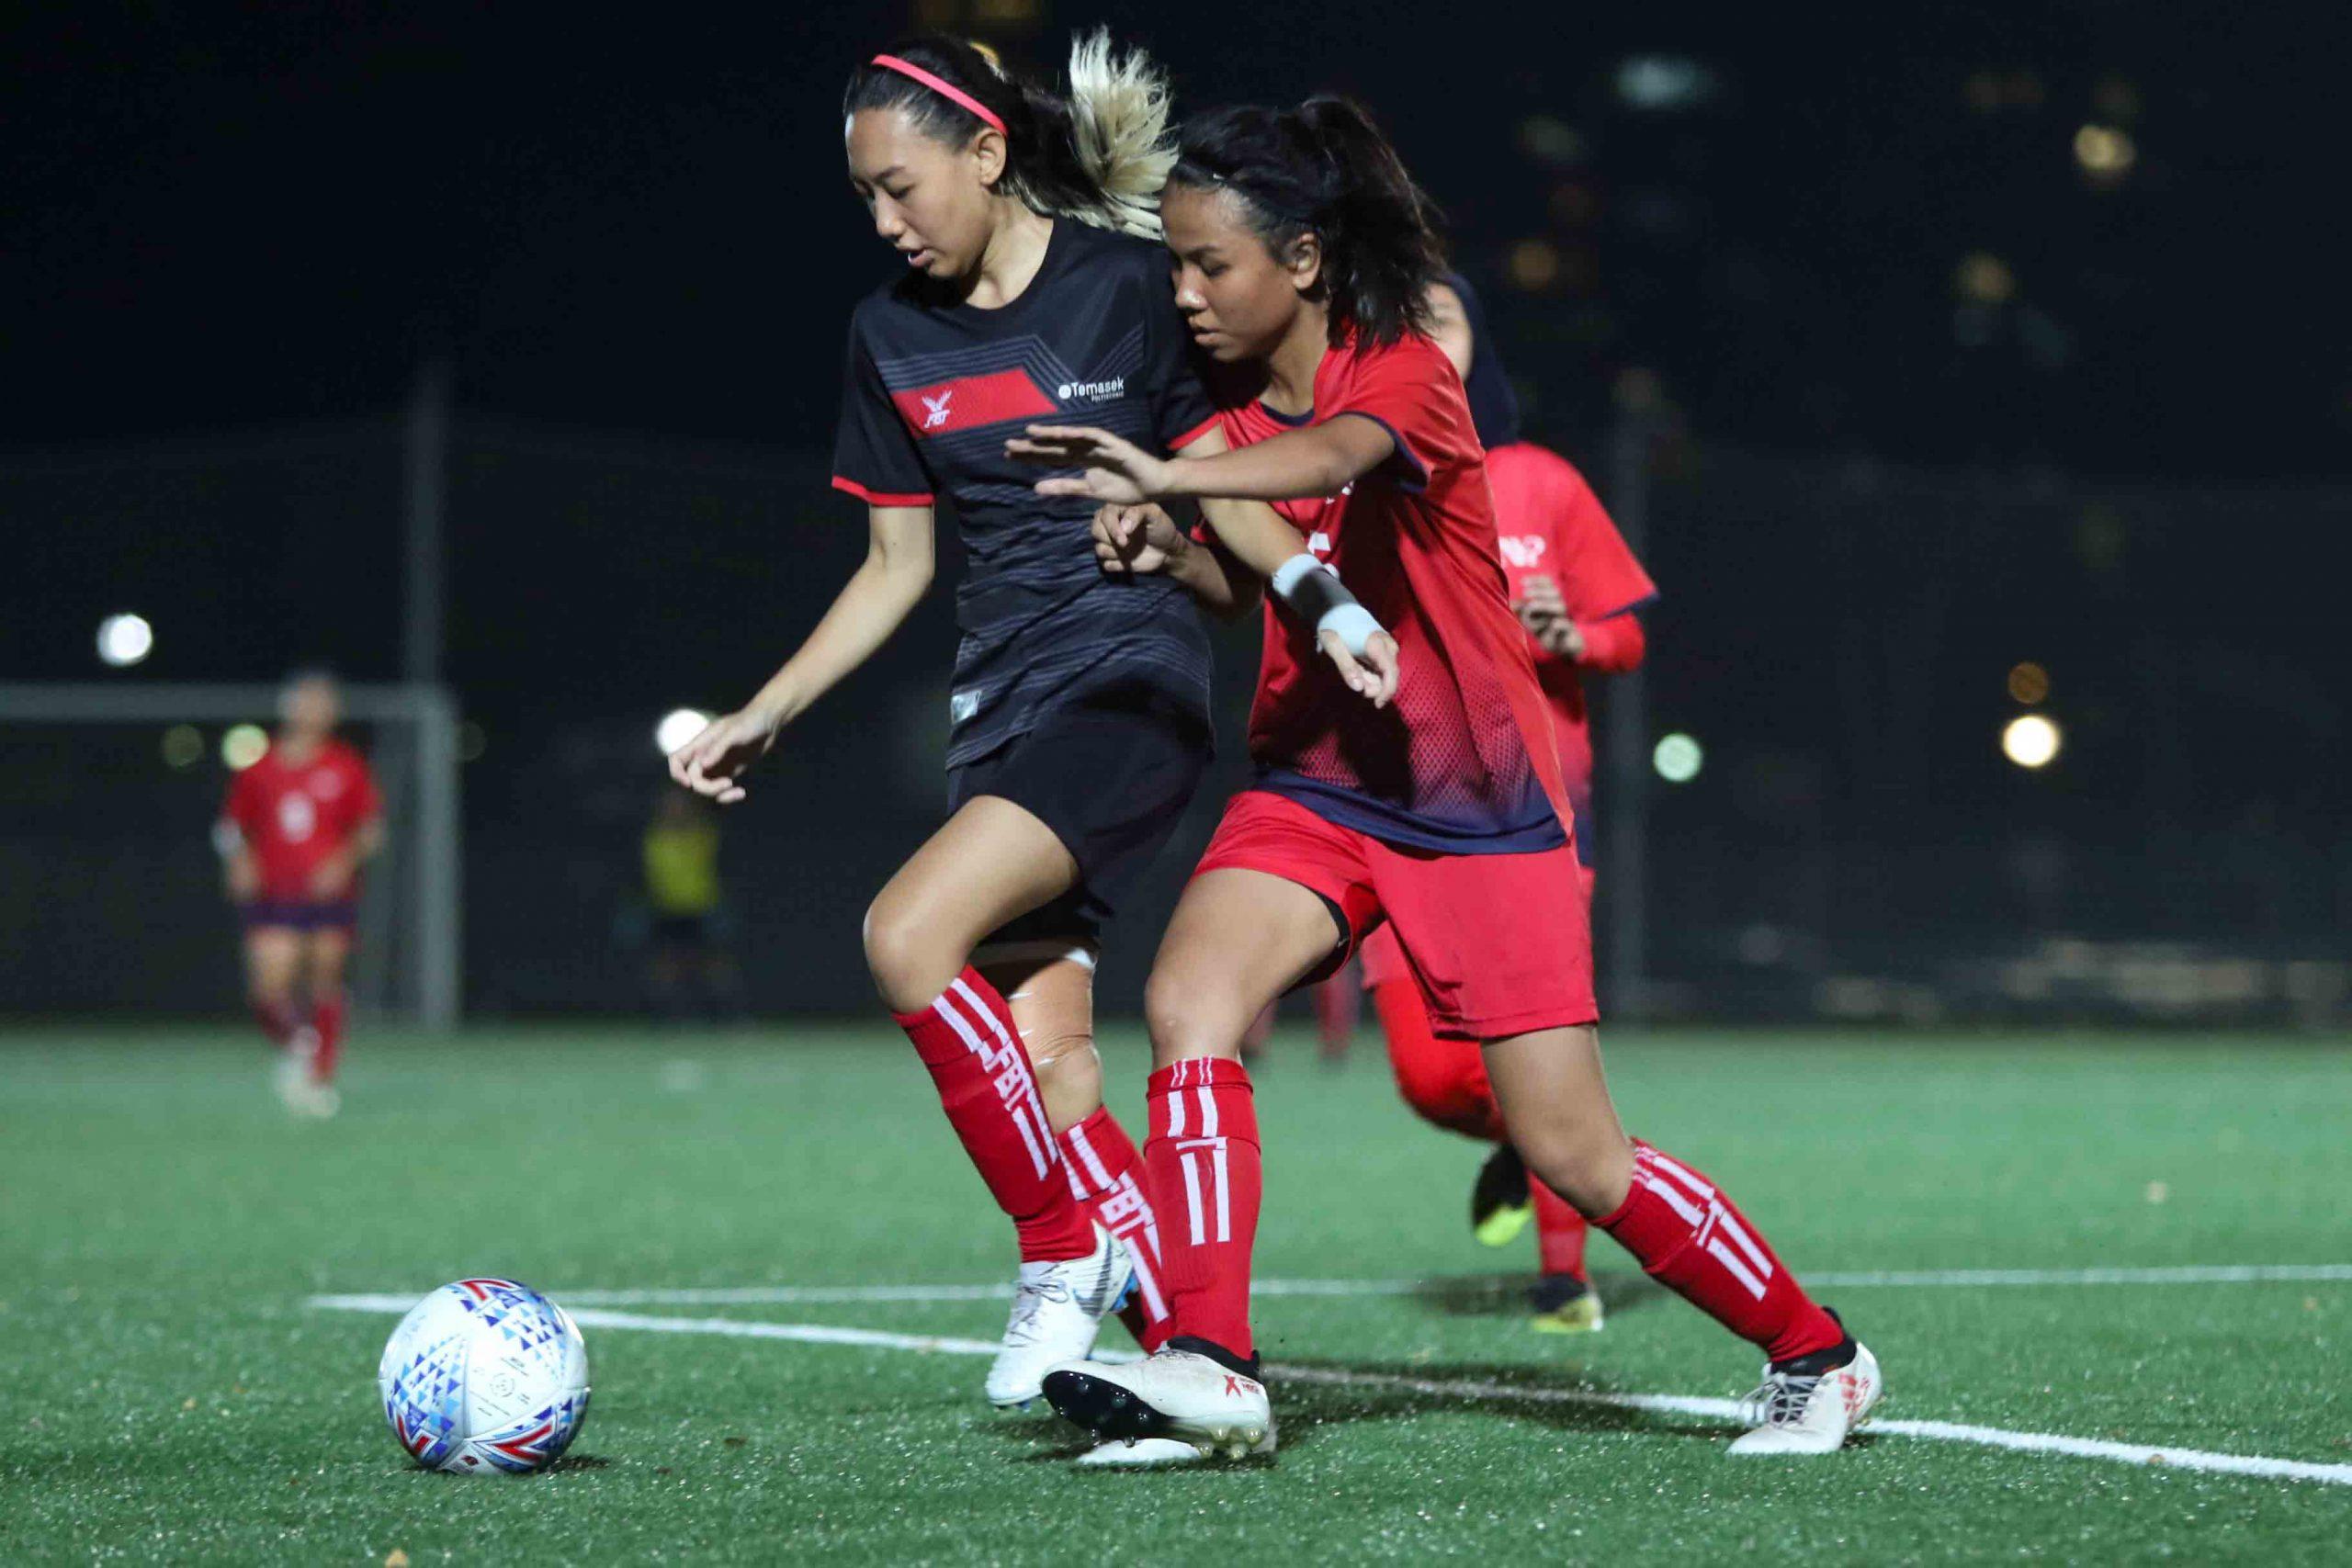 Nur Saidah (TP #15) protects the ball under pressure from Nadia Natasha (NYP #15). (Photo 4 © Clara Lau/Red Sports)